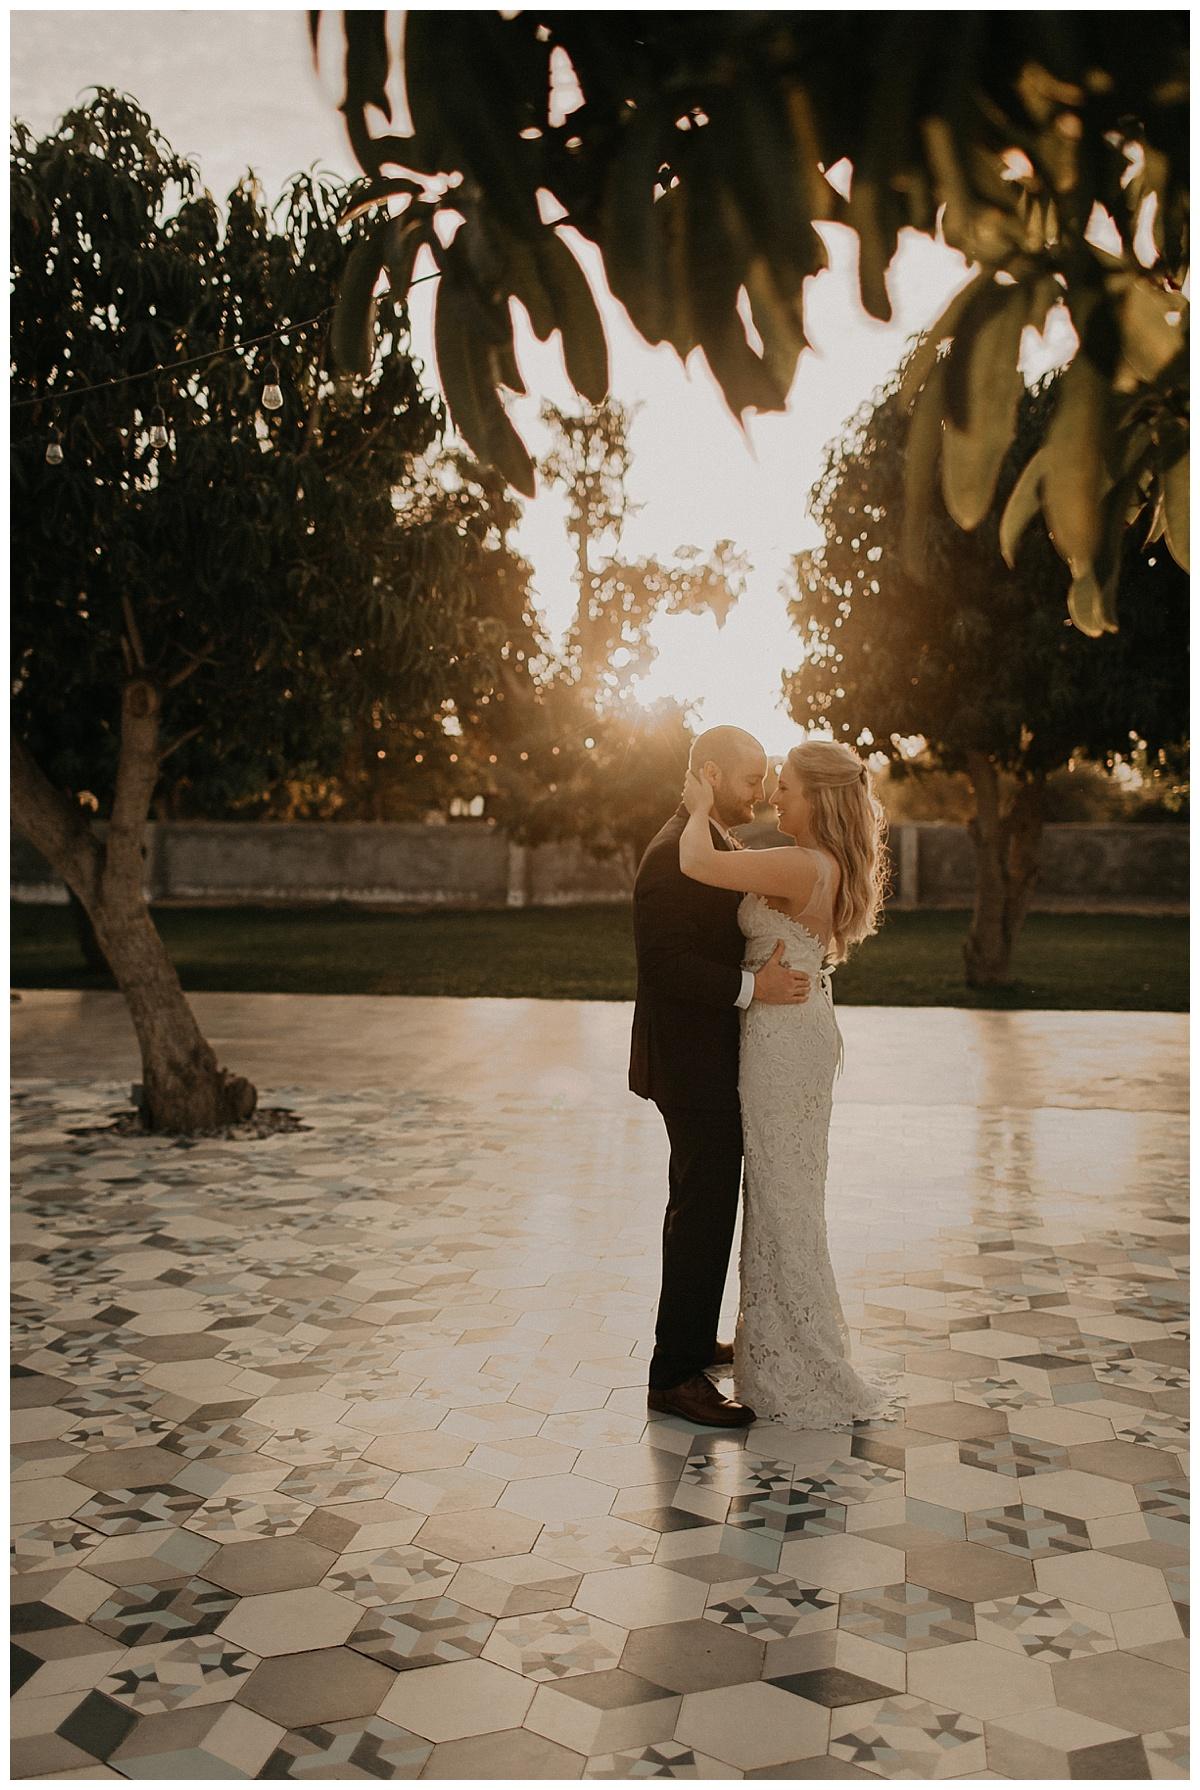 Bixby+Pine-PNW-Wedding-Planners-And-Designers_1620.jpg